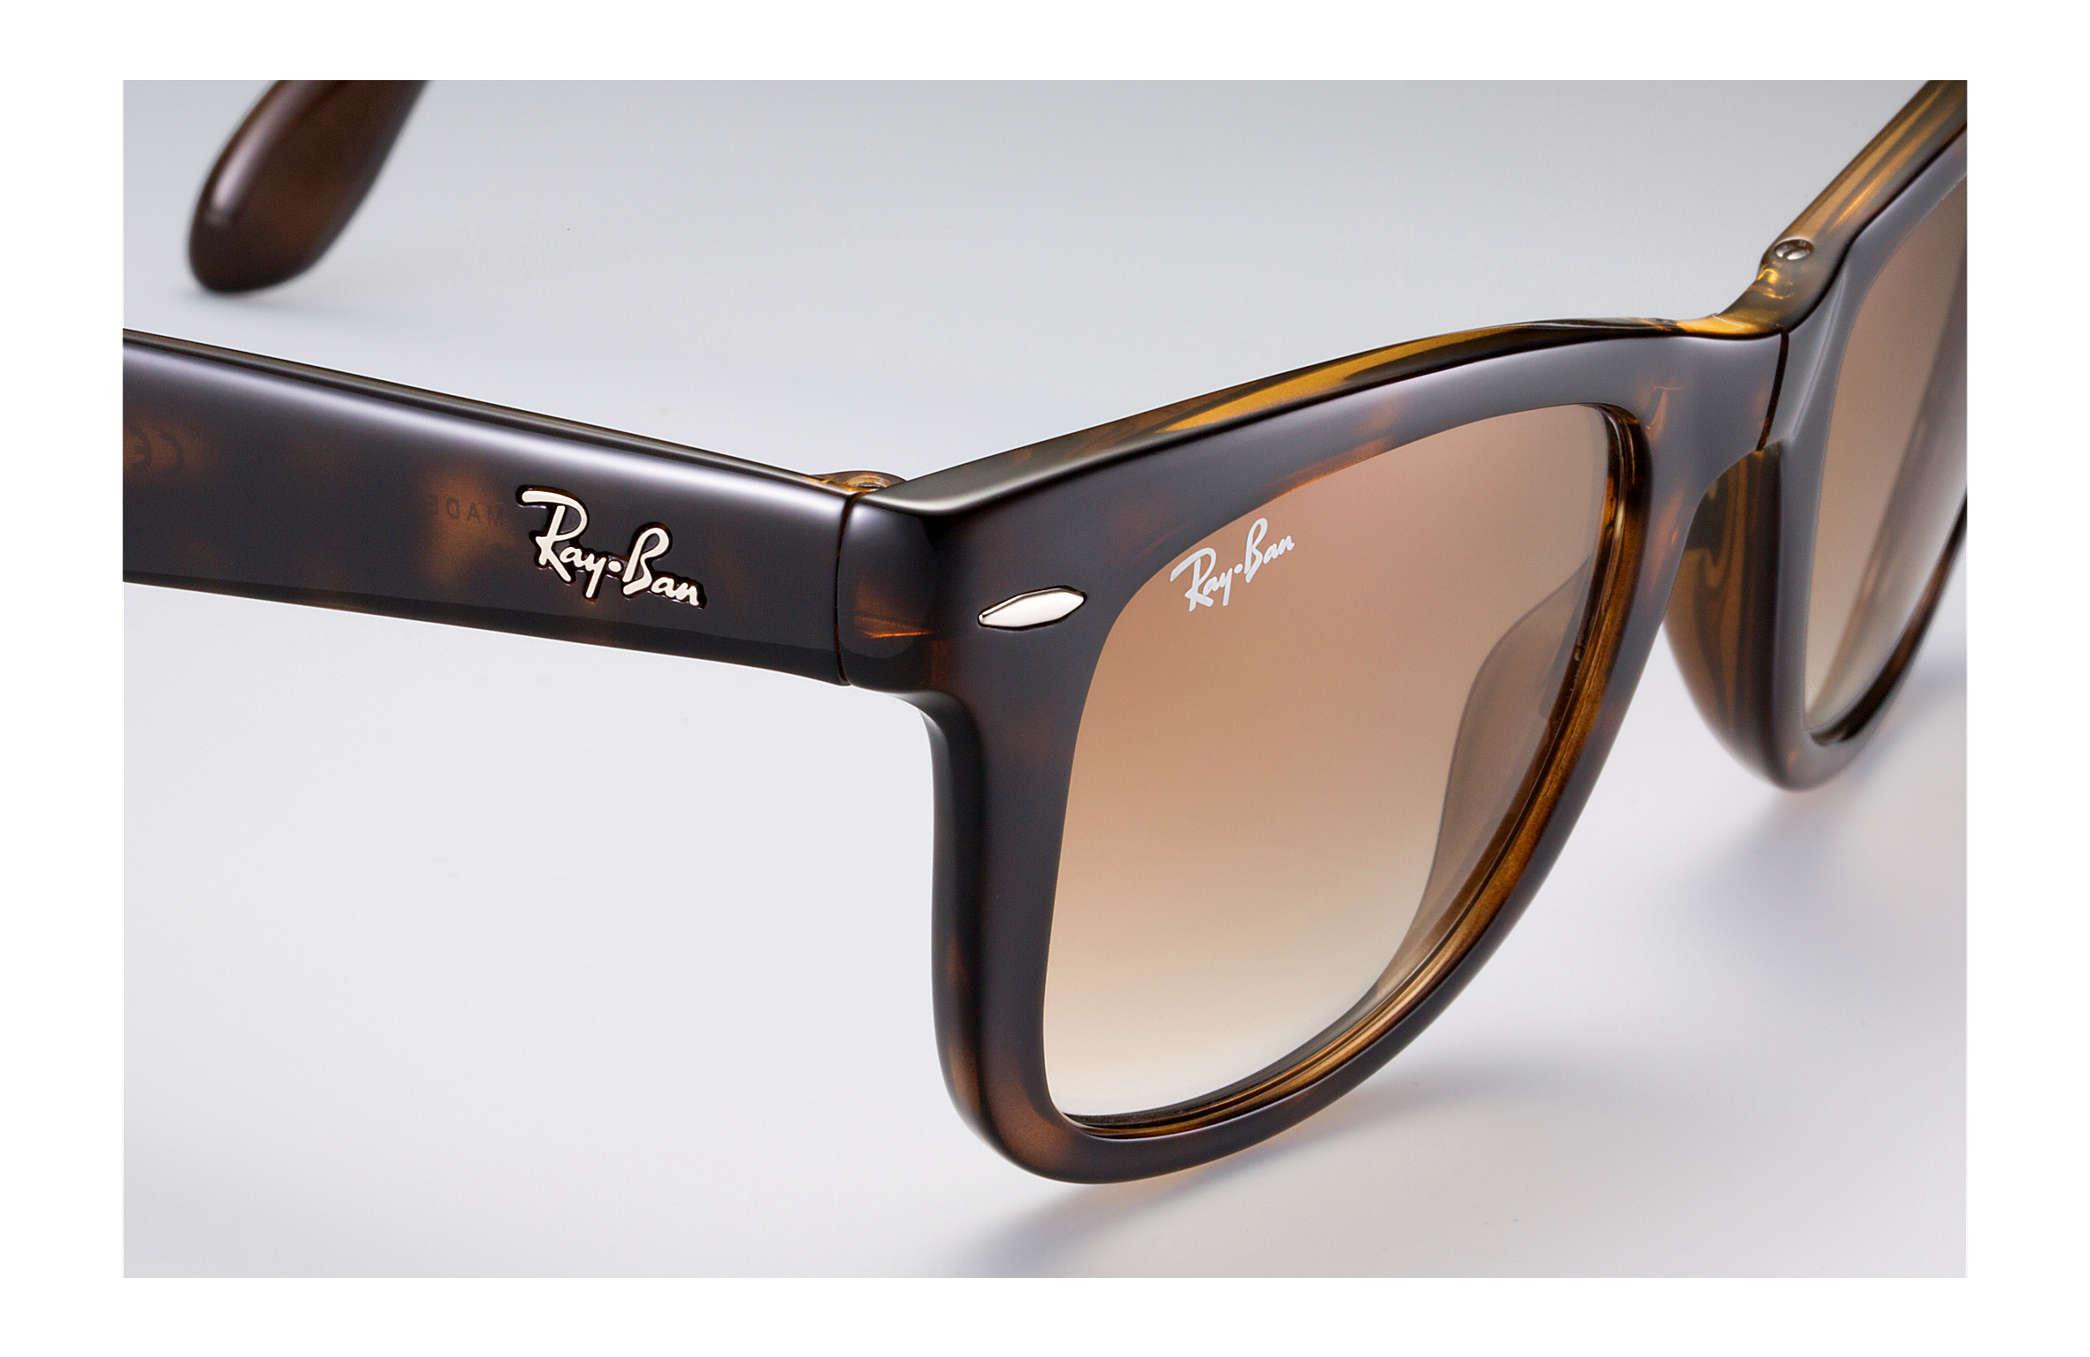 5a7448508a6 Ray-Ban Wayfarer Folding Classic RB4105 Tortoise - Nylon - Light ...